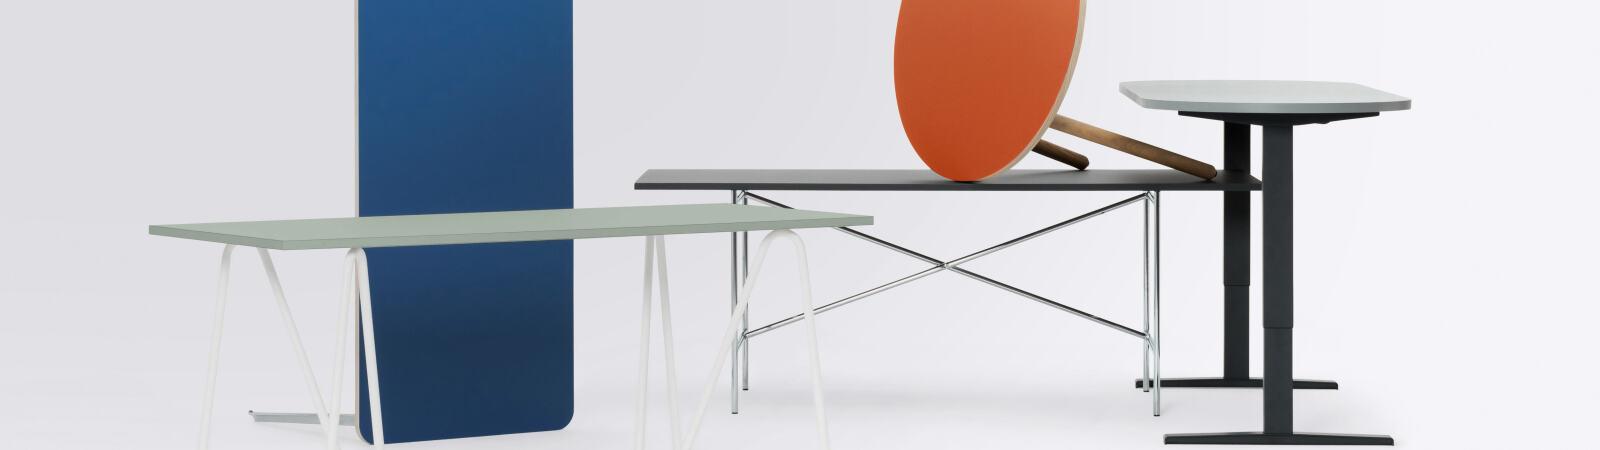 Tables, Table bases, Lino Table Top, Table base, Table legs, Custom model, Desktop, Custom linoleum table tops